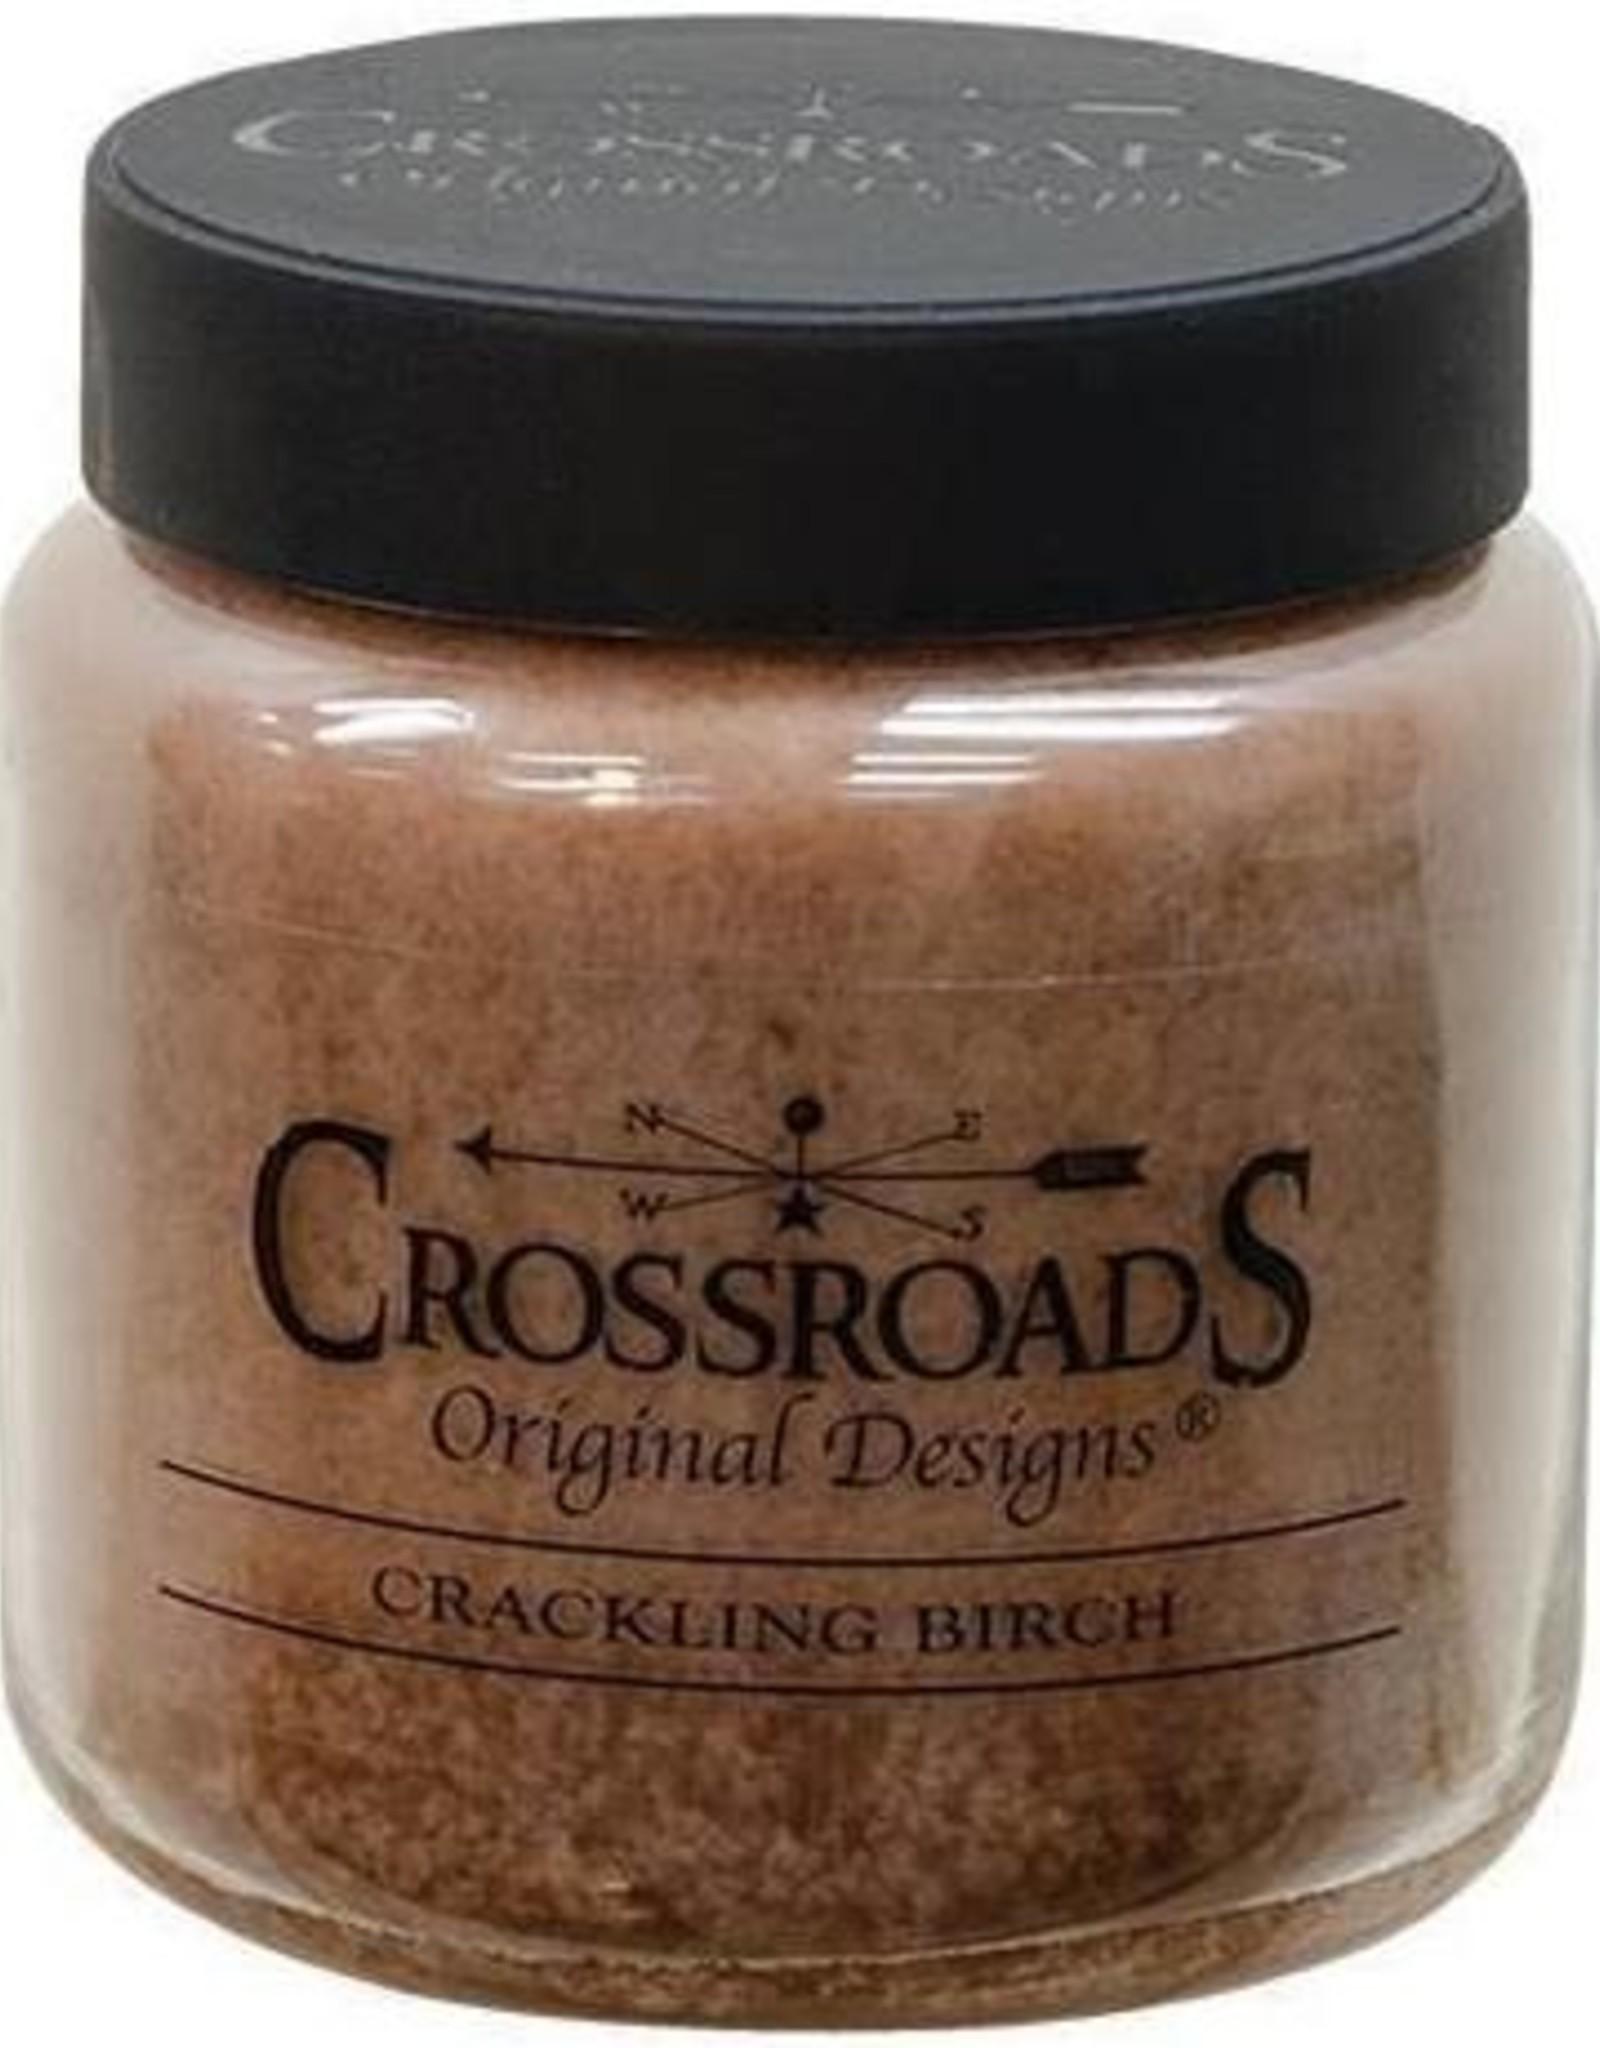 Crossroads Crackling Birch Candle 64 oz